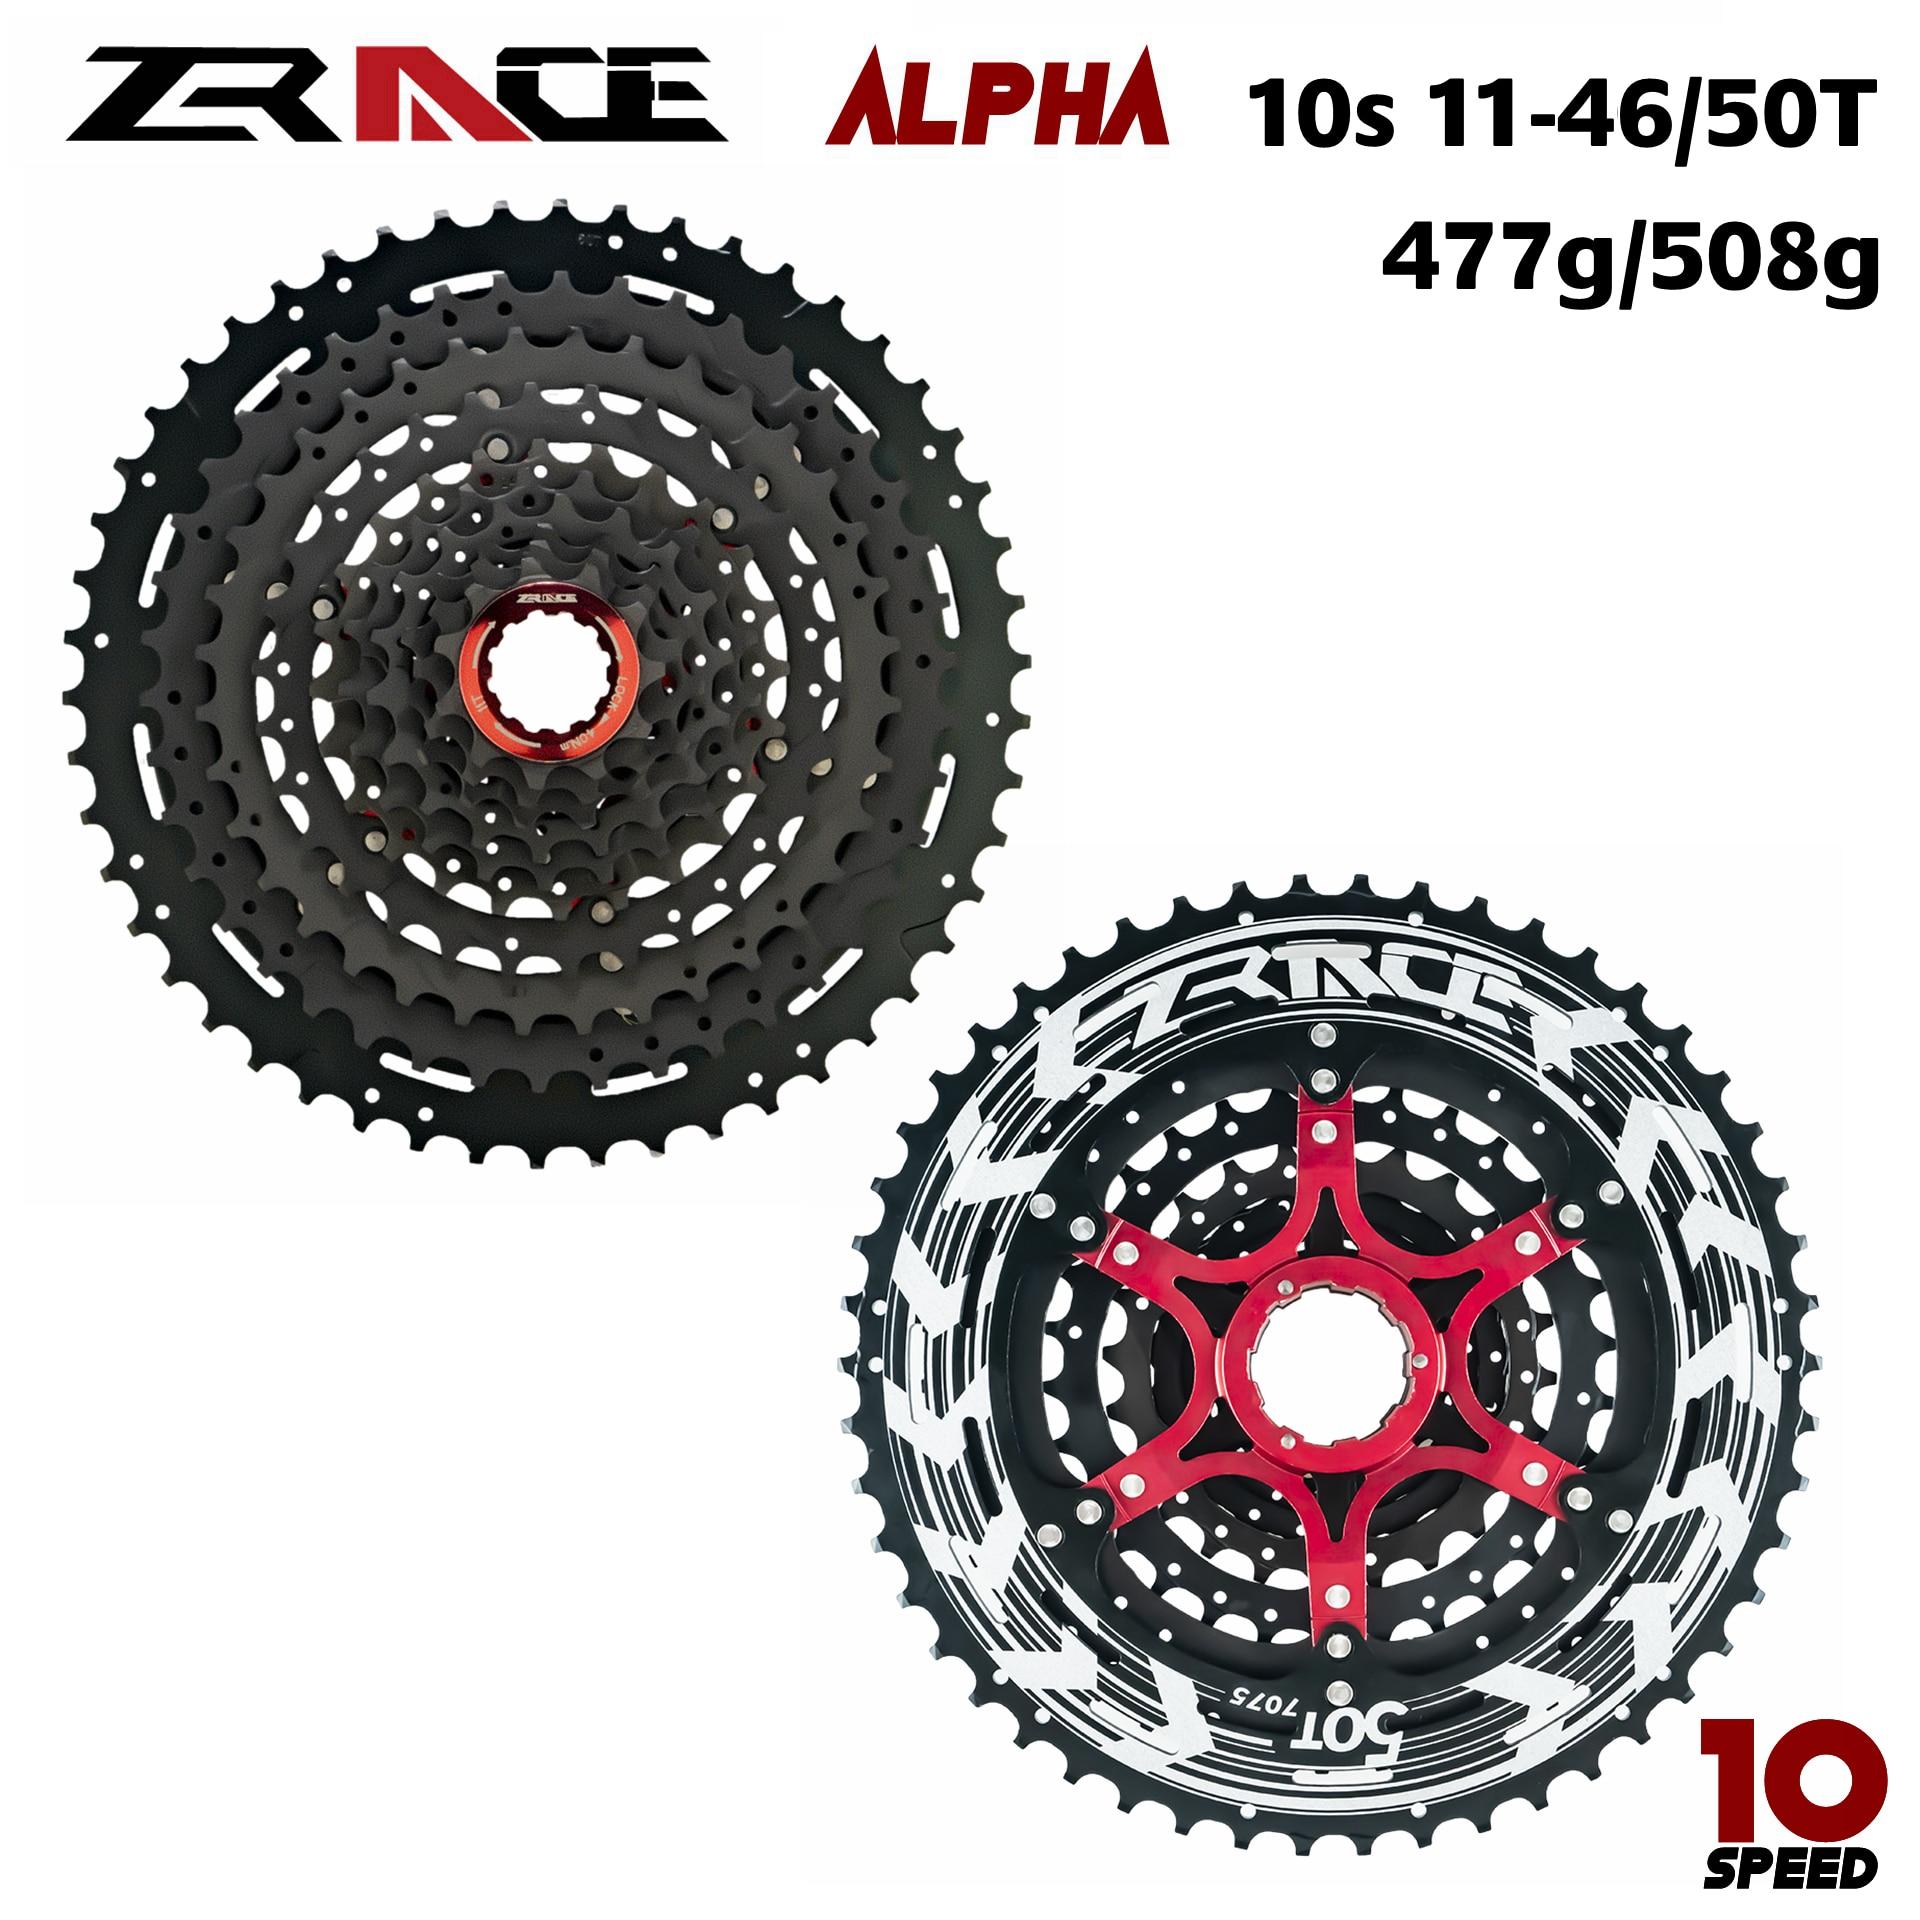 Zrace alpha 10s light castete 100s MTB speed bicycle free runner 11-46 T / 50 t-negro